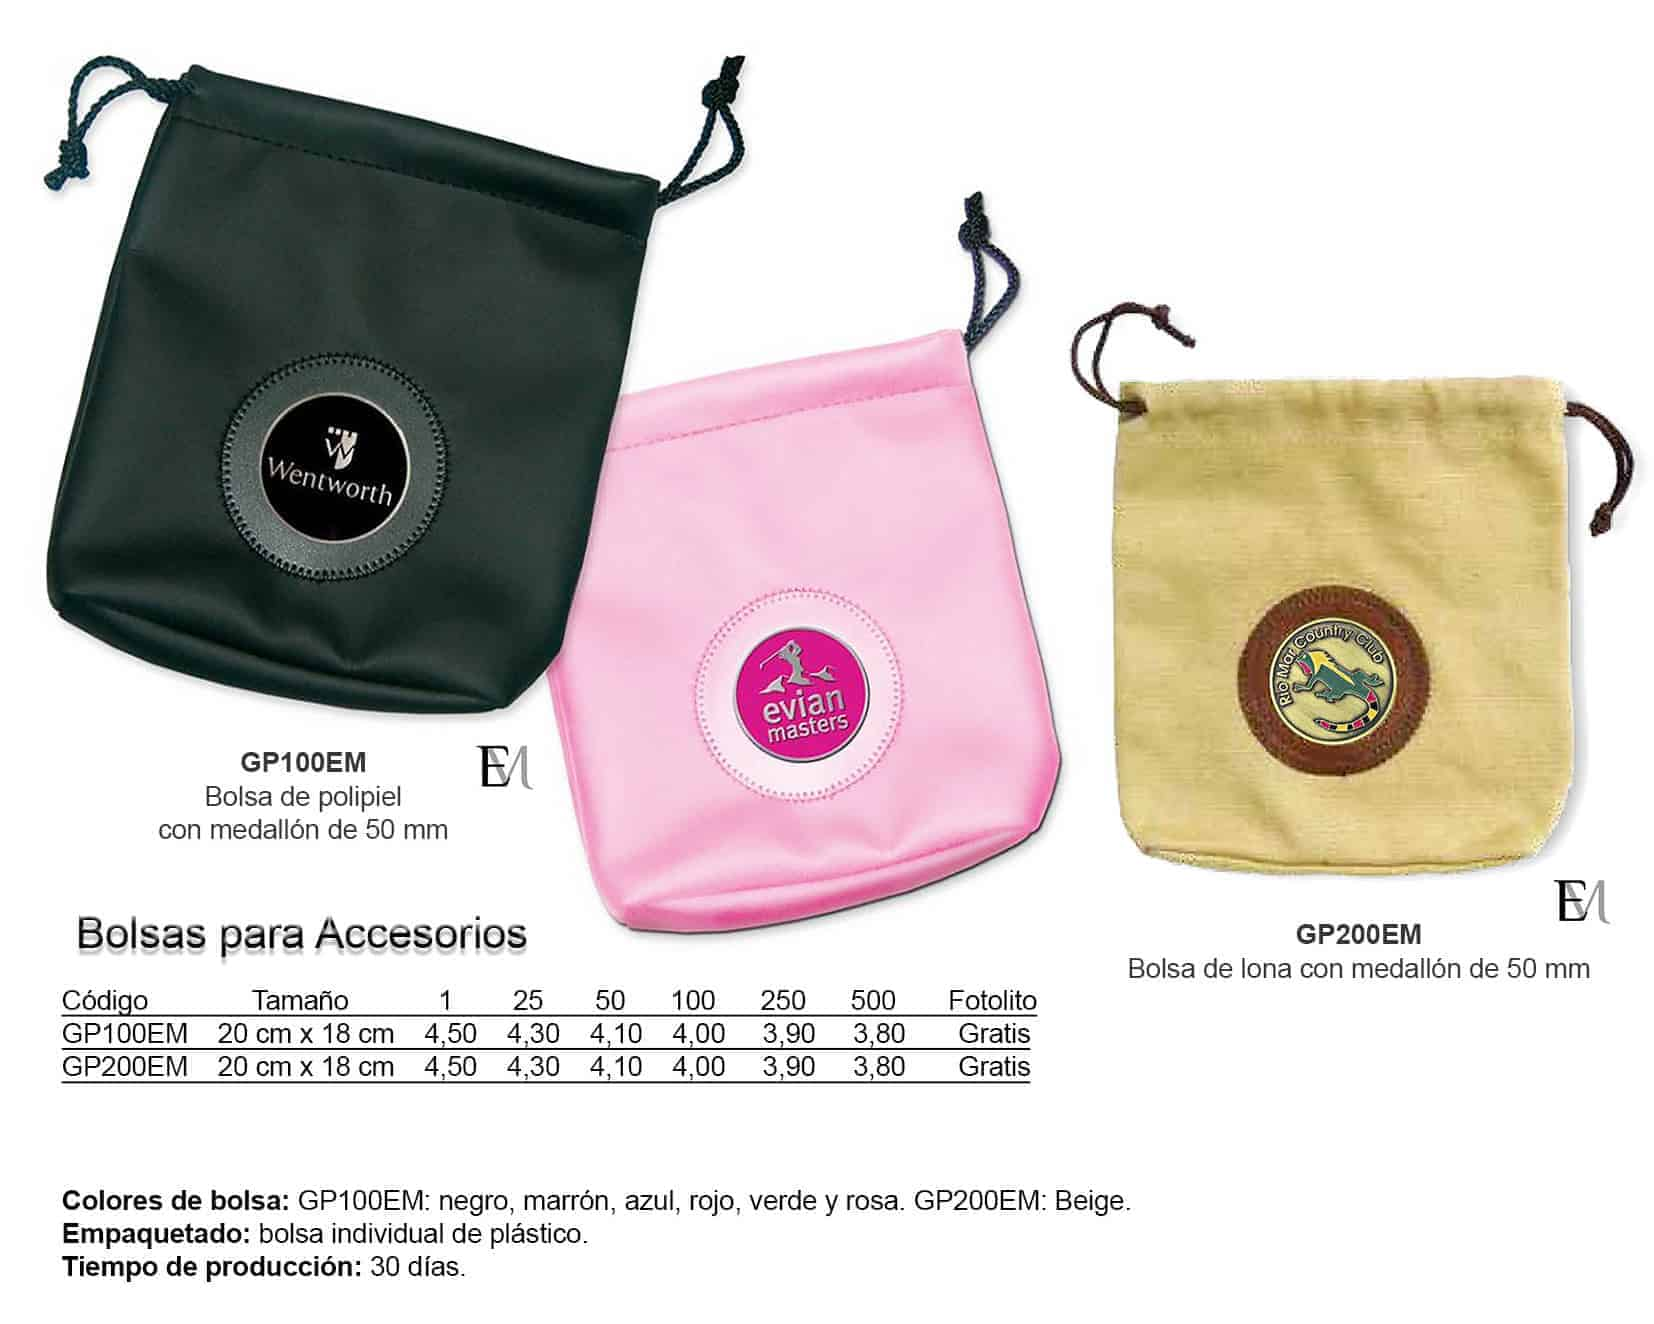 Bolsas para accesorios para golf personalizadas Emblemarket